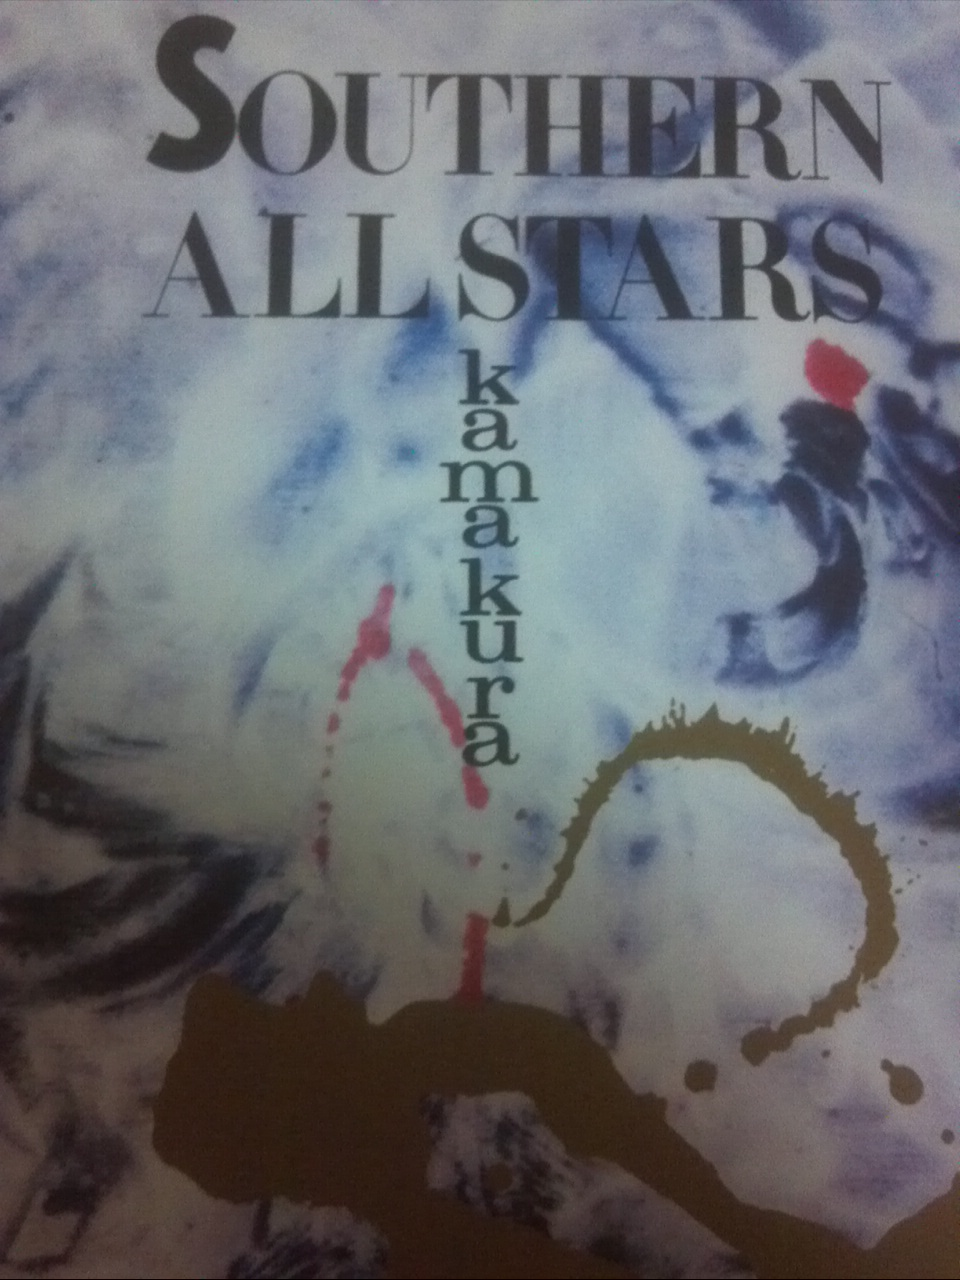 Southern all stars;kamakura